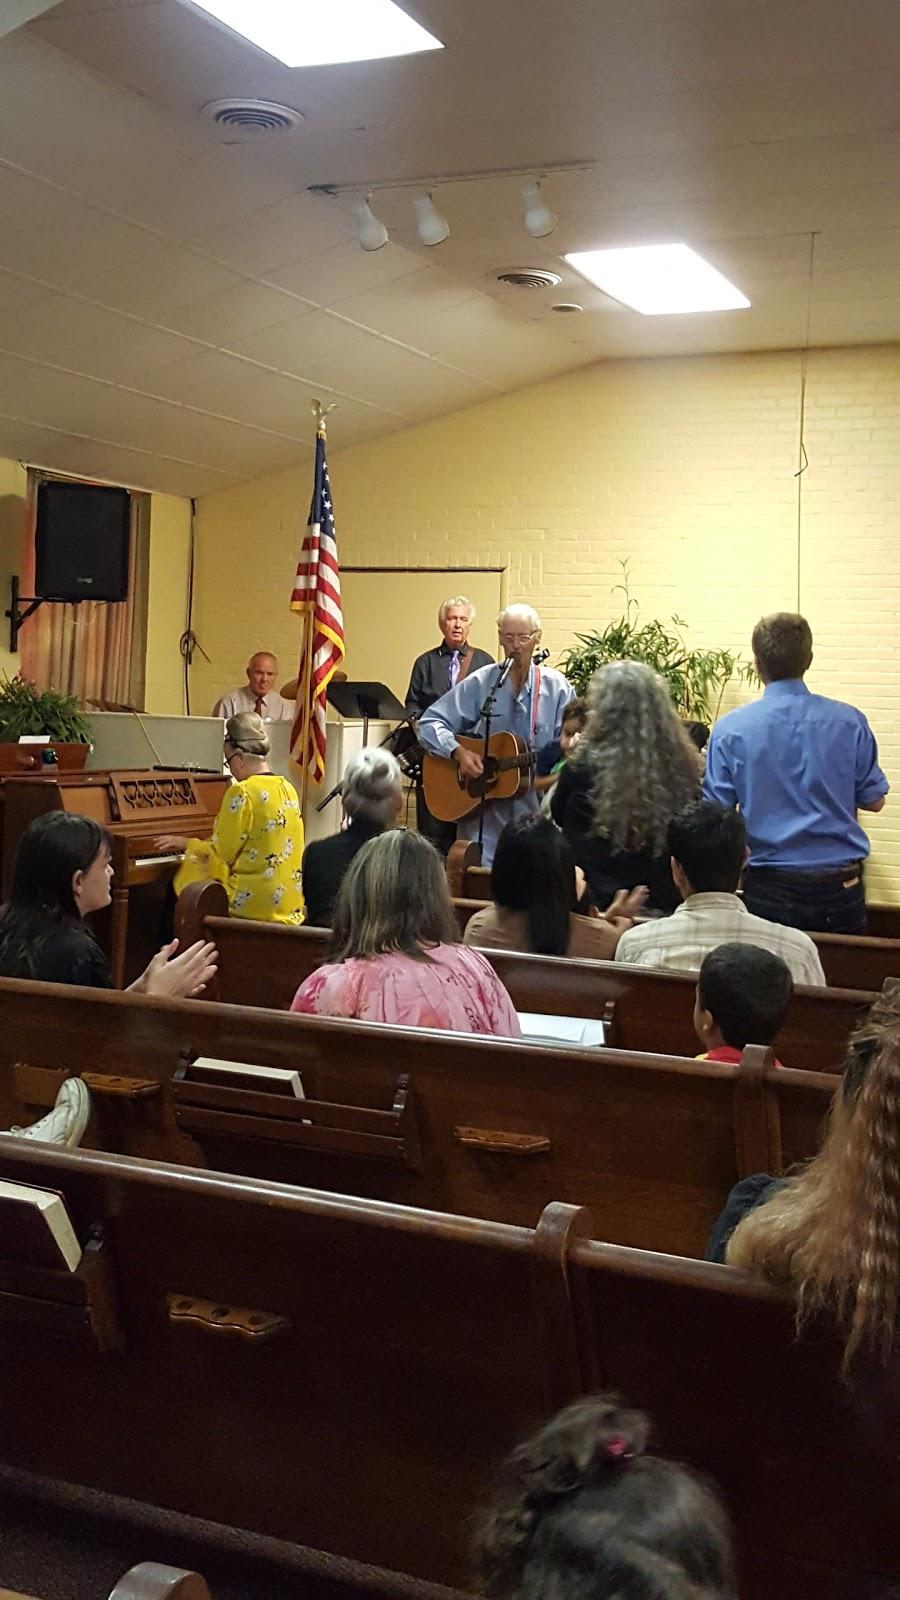 Deeper Life Church - church    Photo 1 of 2   Address: 2028 27th Ave N, Hueytown, AL 35023, USA   Phone: (205) 491-9100